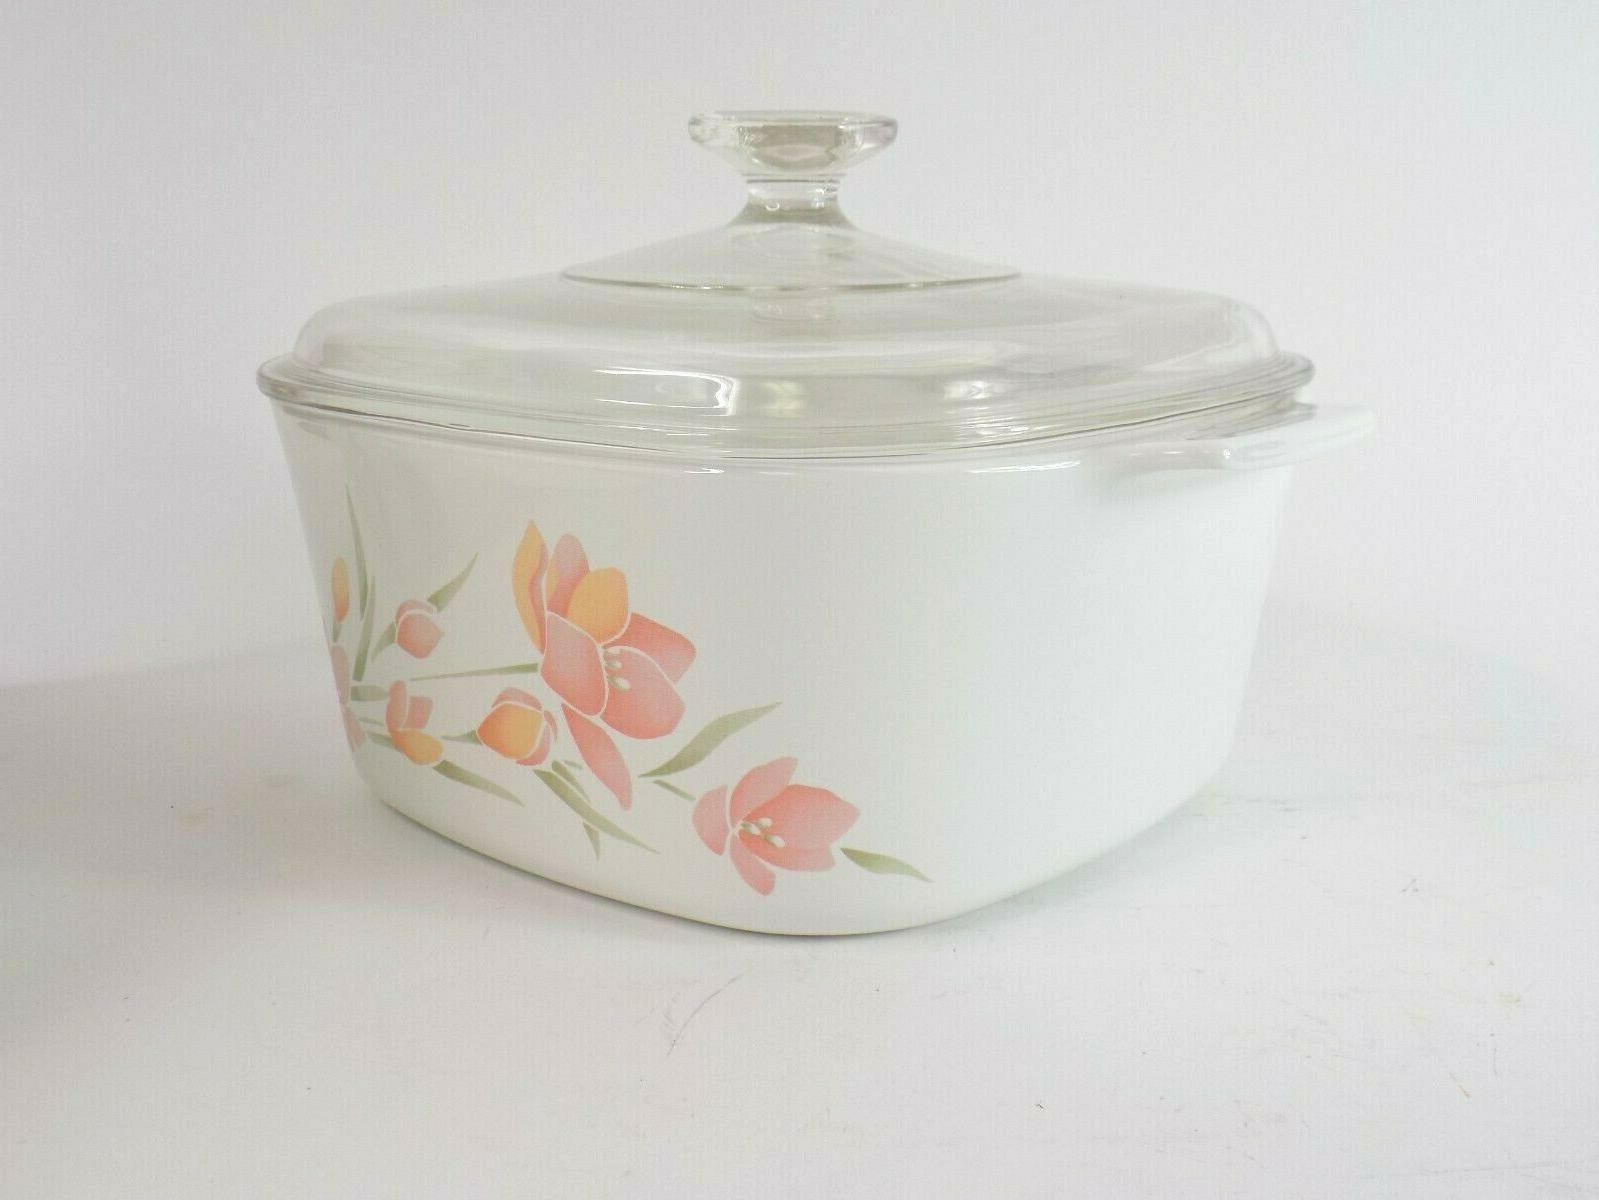 Vintage Corningware Casserole Peach Floral